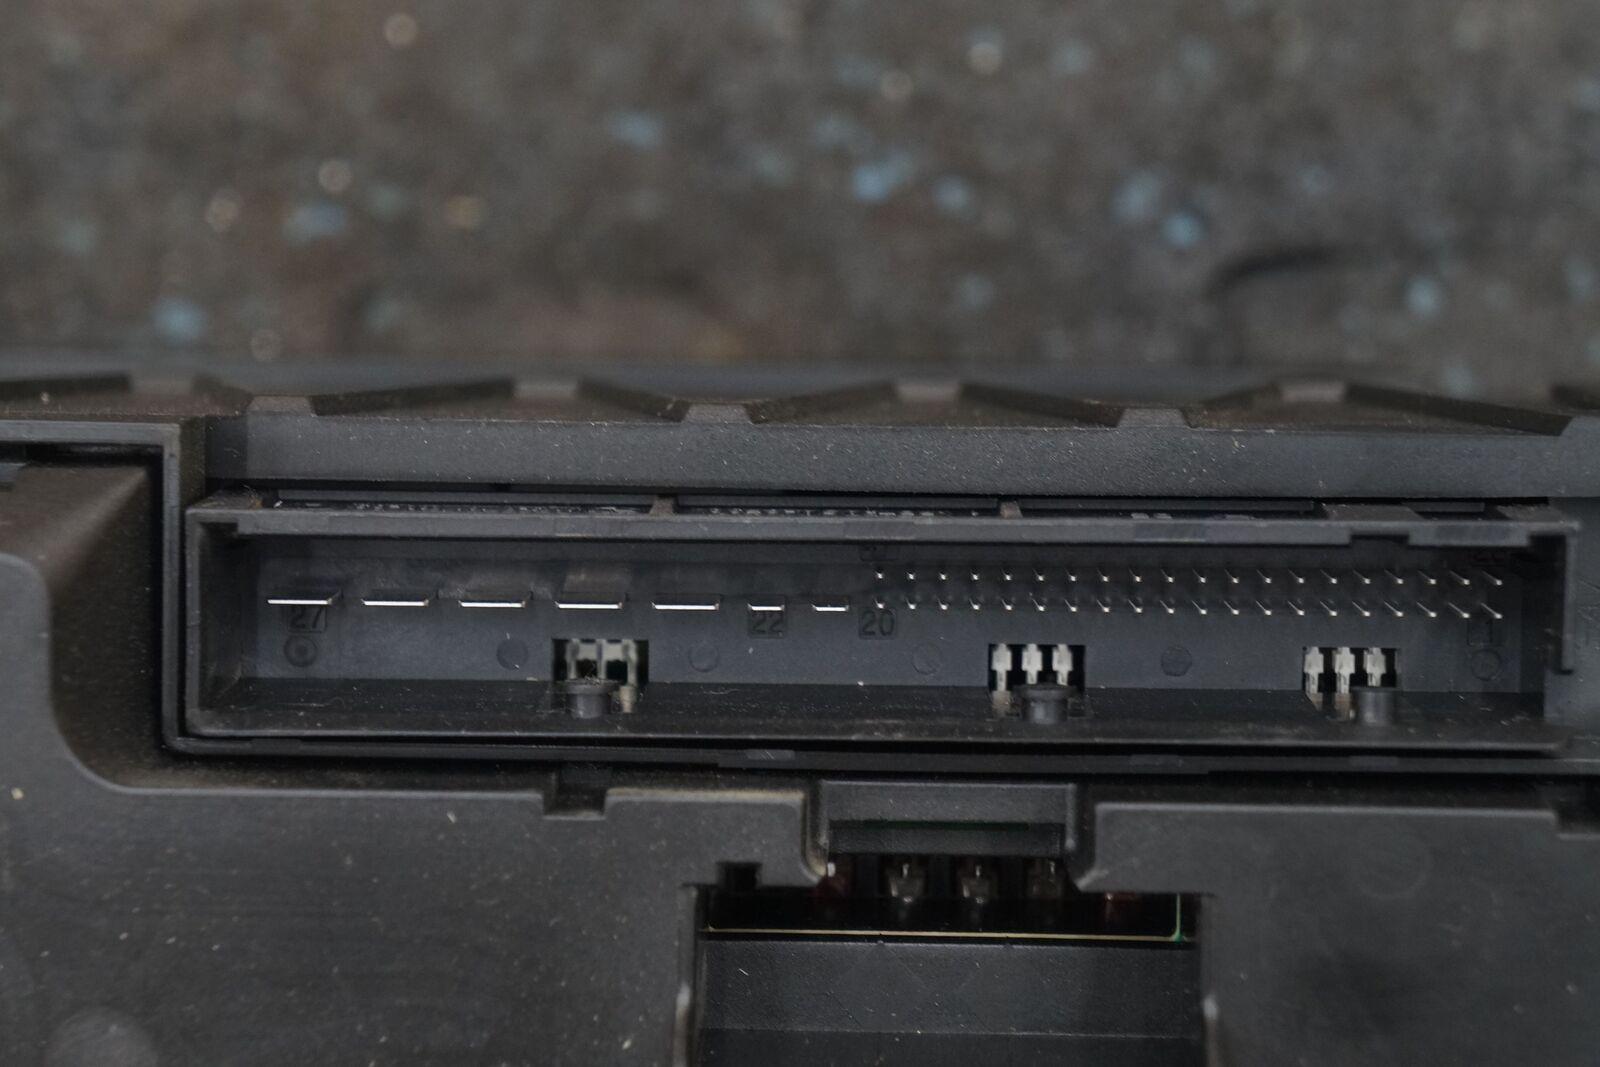 Bmw 318i Fuse Box Diagram Bmw E36 Wiring Diagrams 2005 Bmw X5 Fuse Box